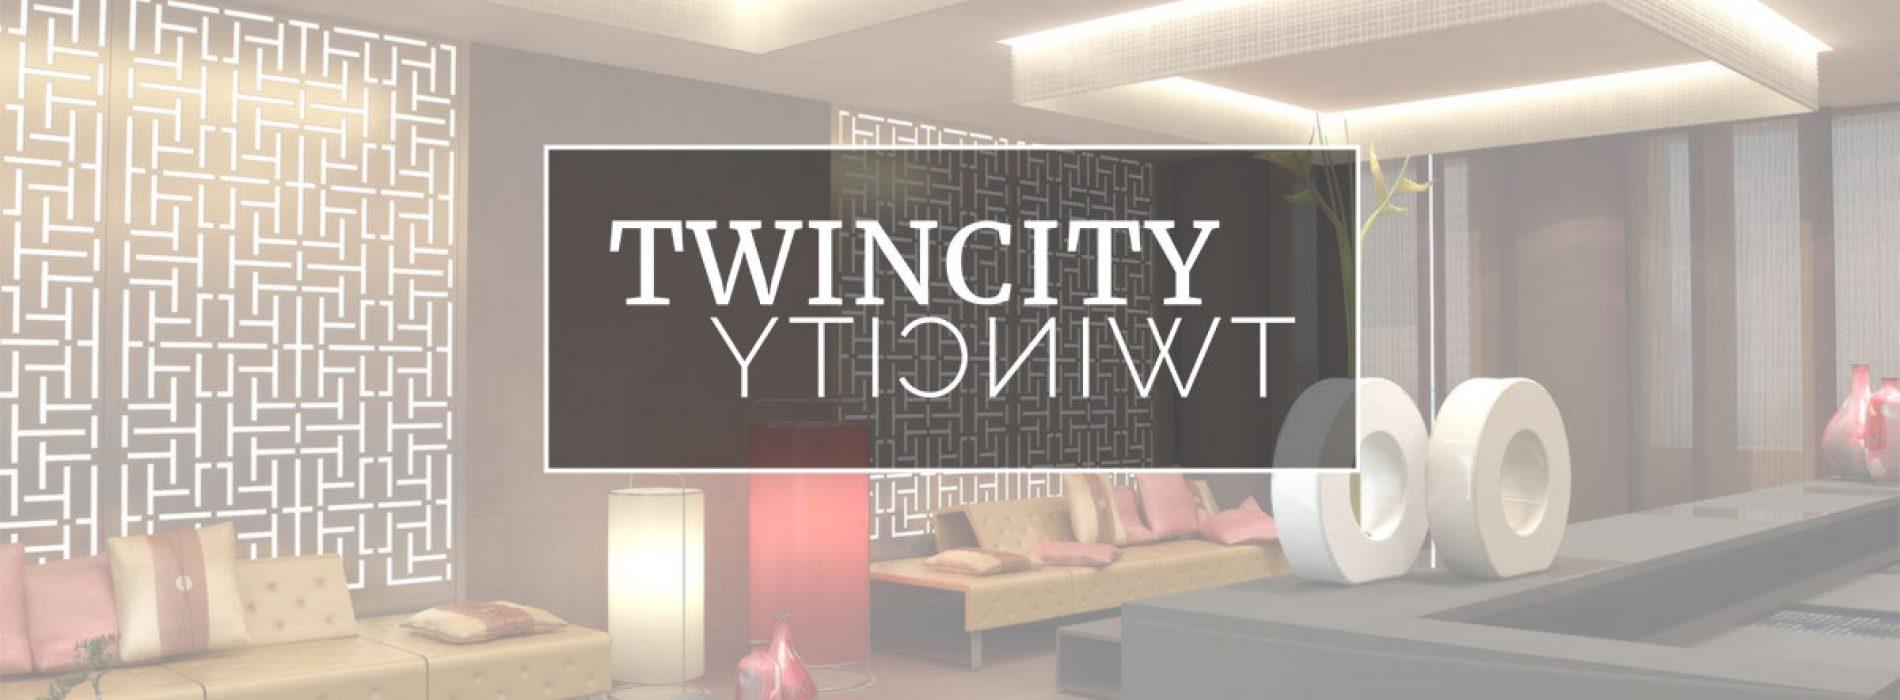 Guangzhou and Milan Twin City – Civilization Redesign